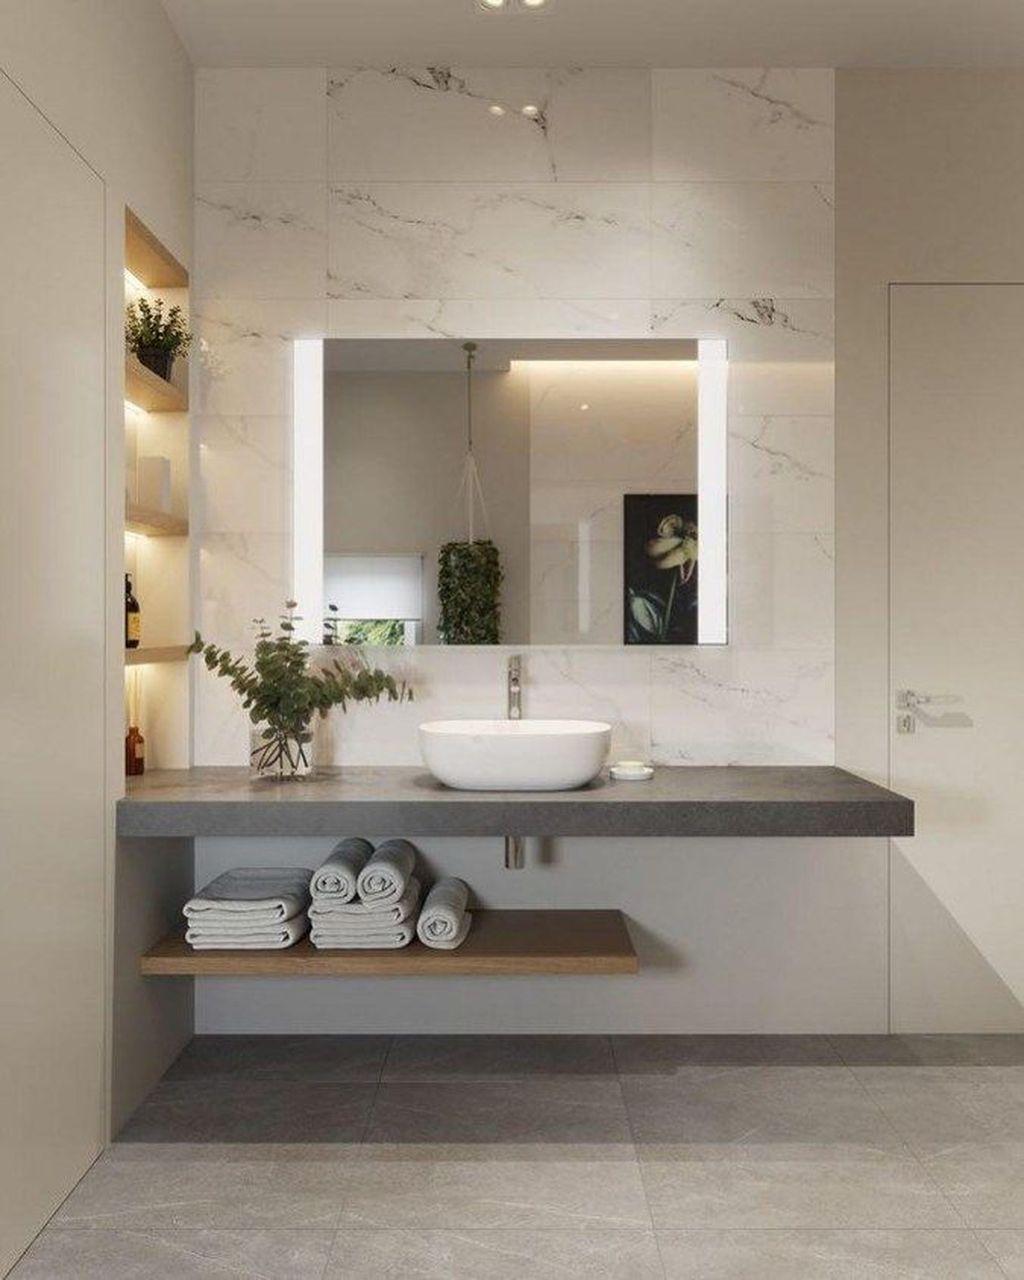 Unusual Bathroom Design Ideas You Need To Know 28